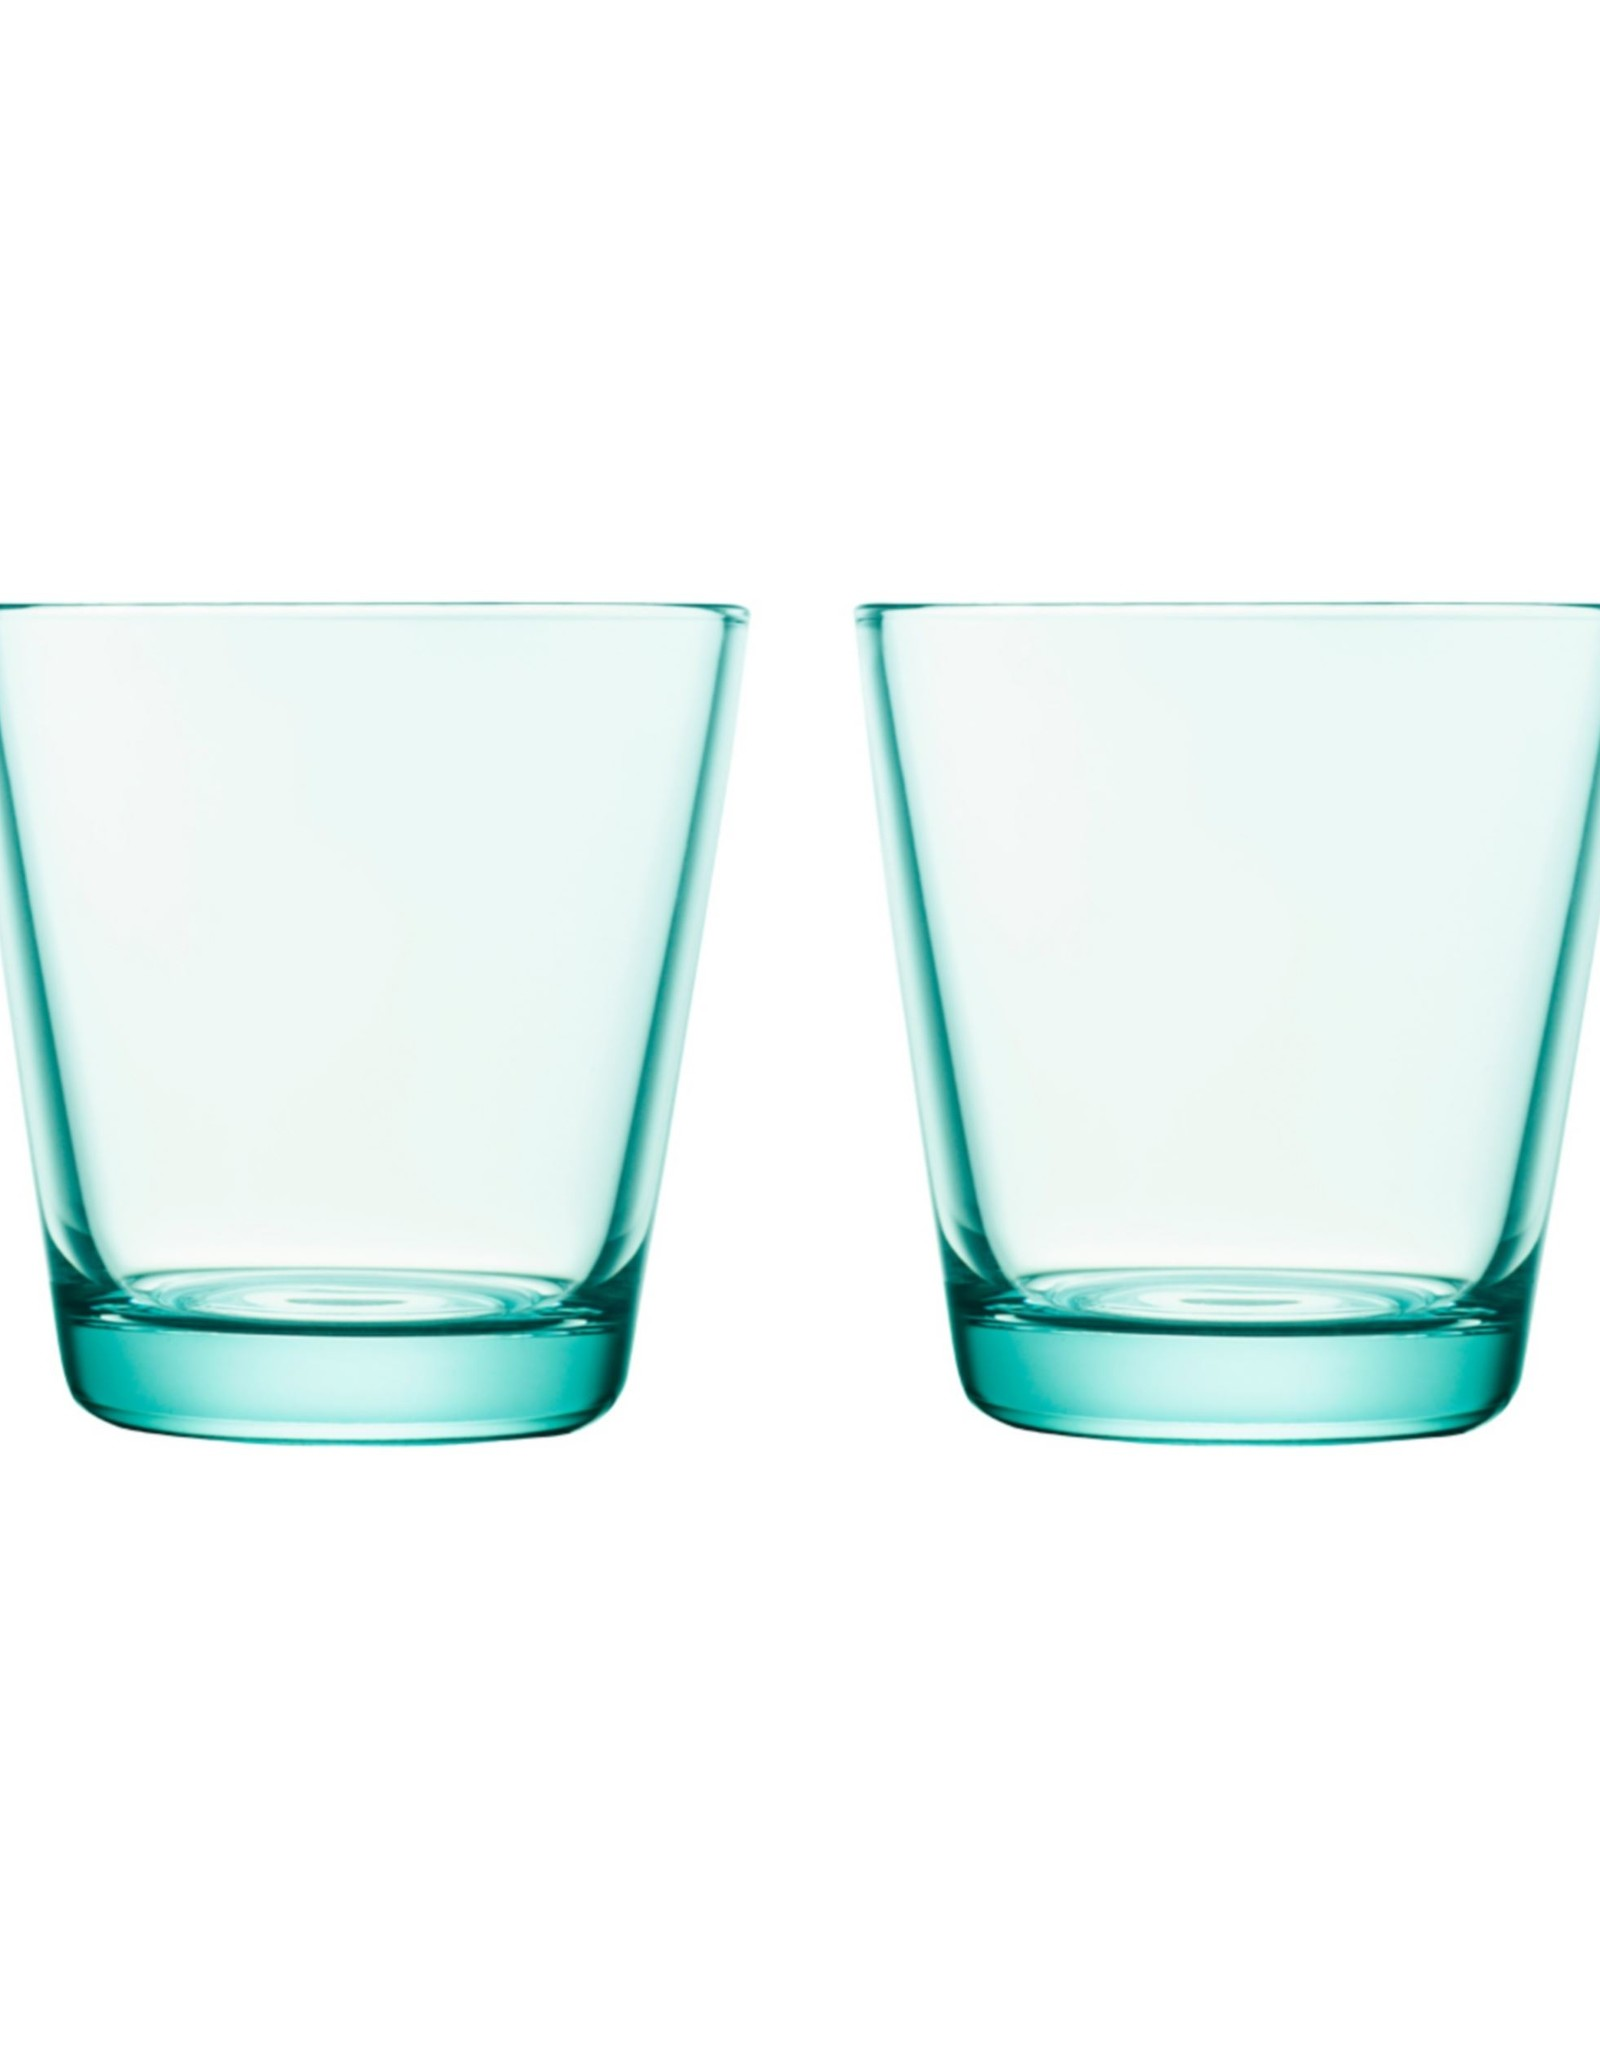 Iittala Iittala Kartio Glas - 21 cl - Watergroen - 2 stuks